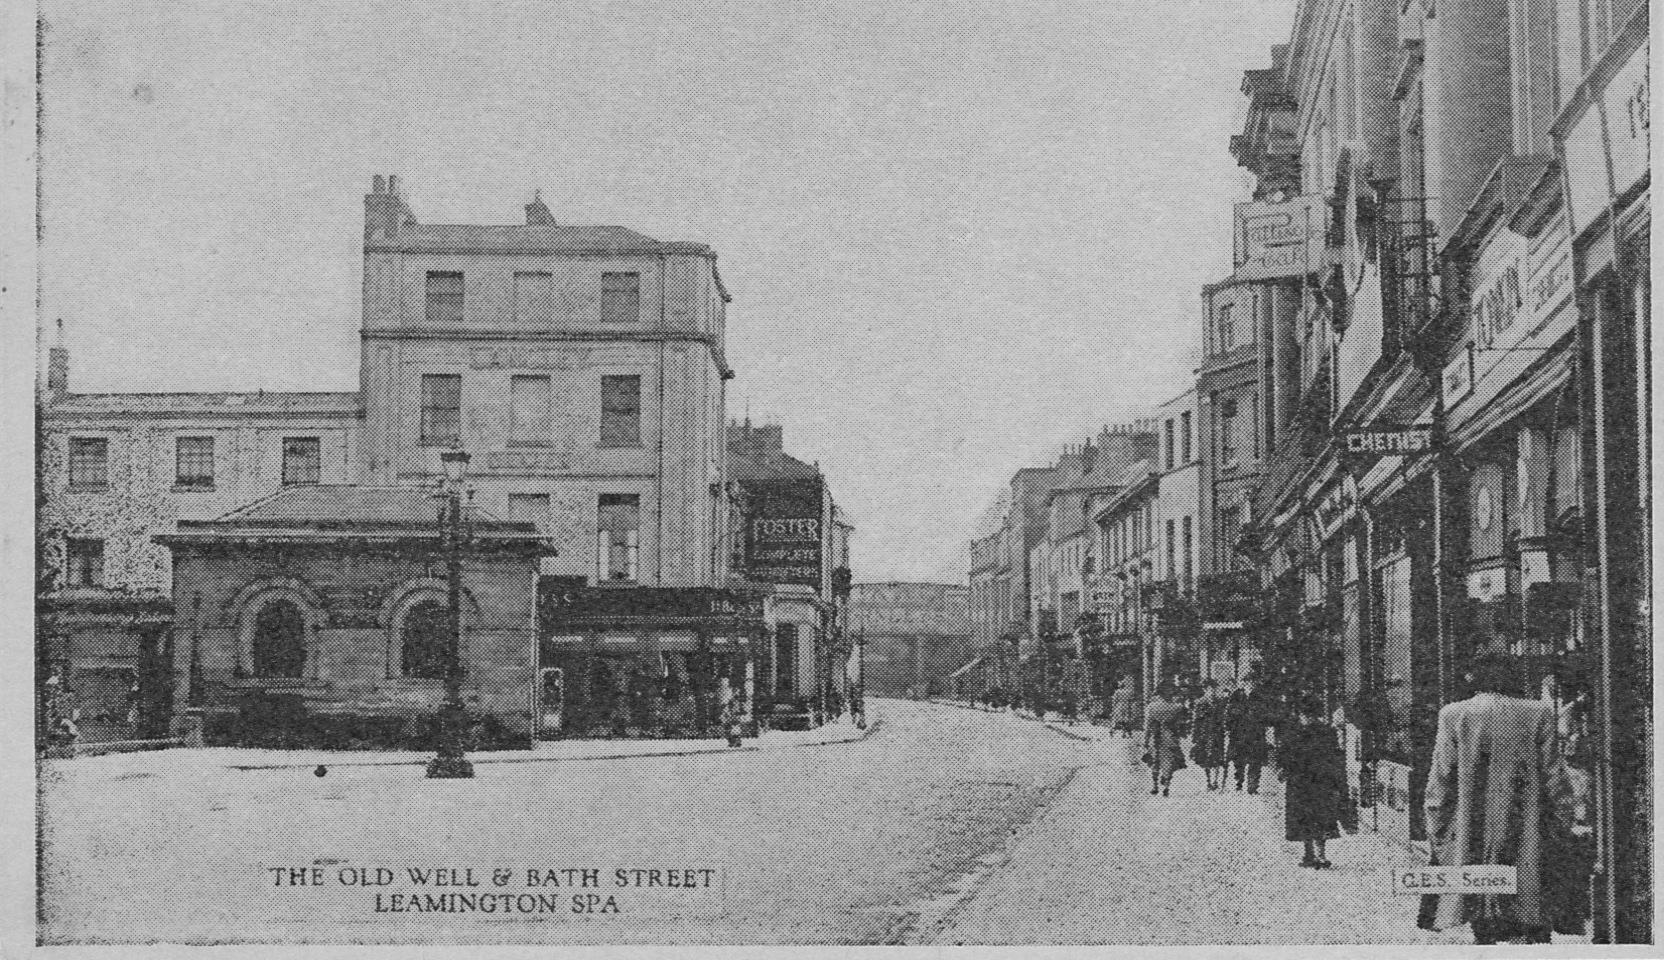 Aylesford Well & Bath Street